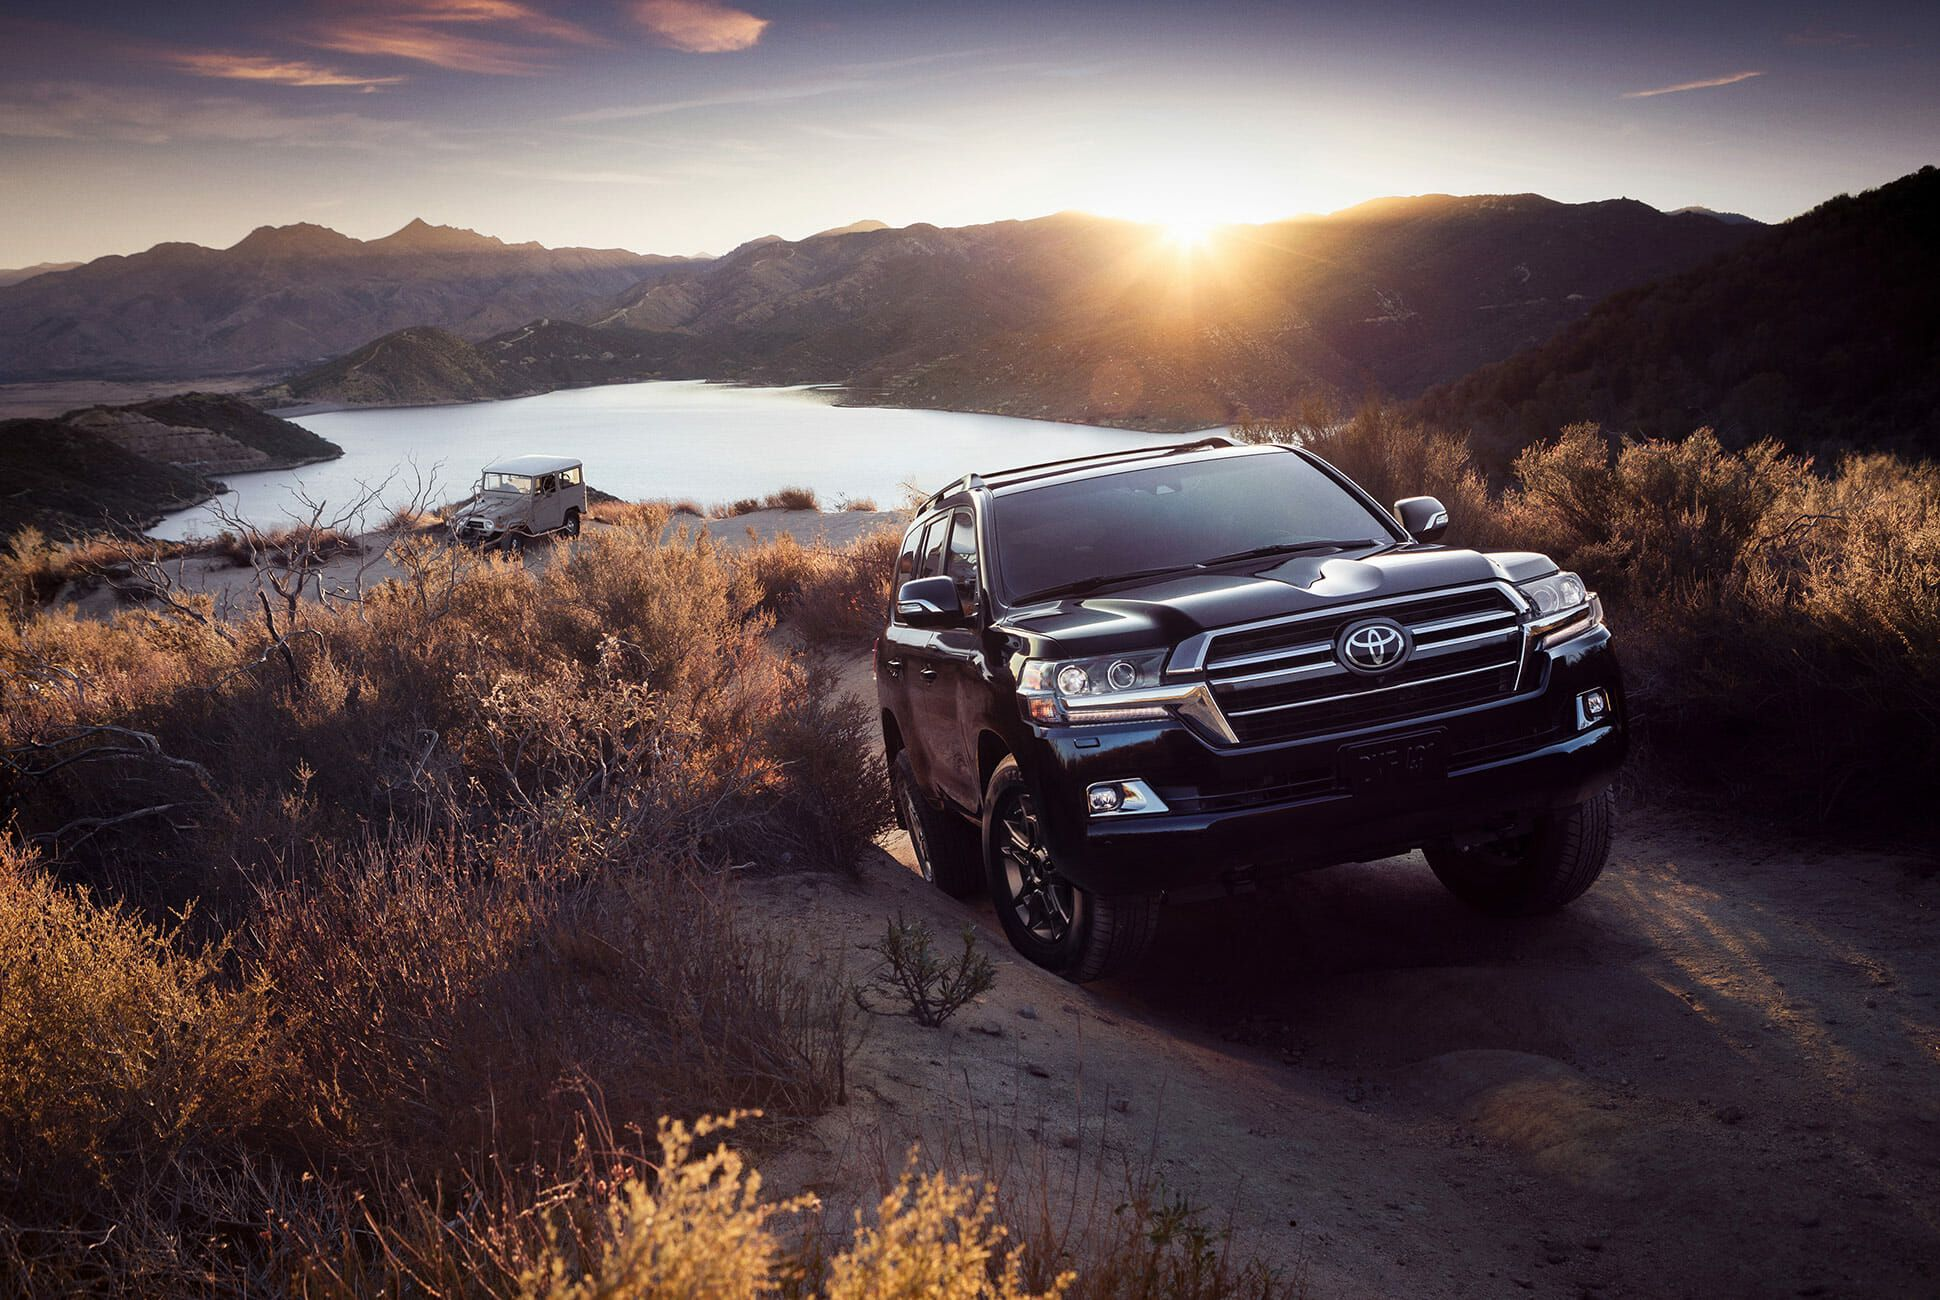 Toyota-Land-Cruiser-Heritage-Edition-gear-patrol-slide-1